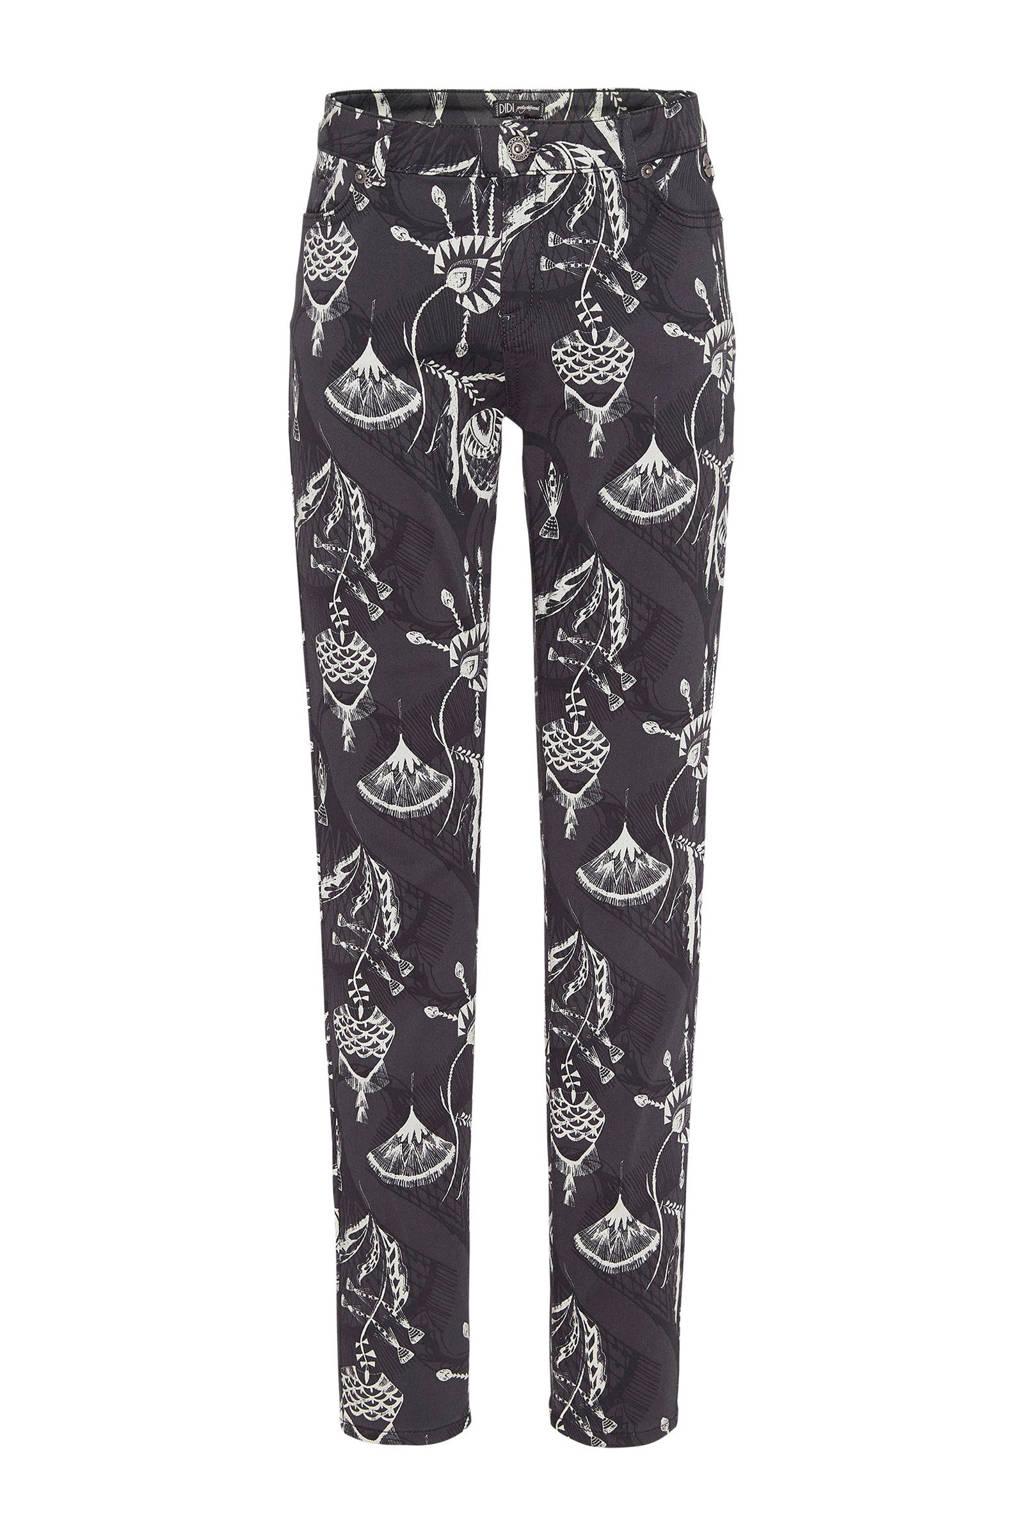 Didi skinny jeans met all over print, Antraciet/ Ecru